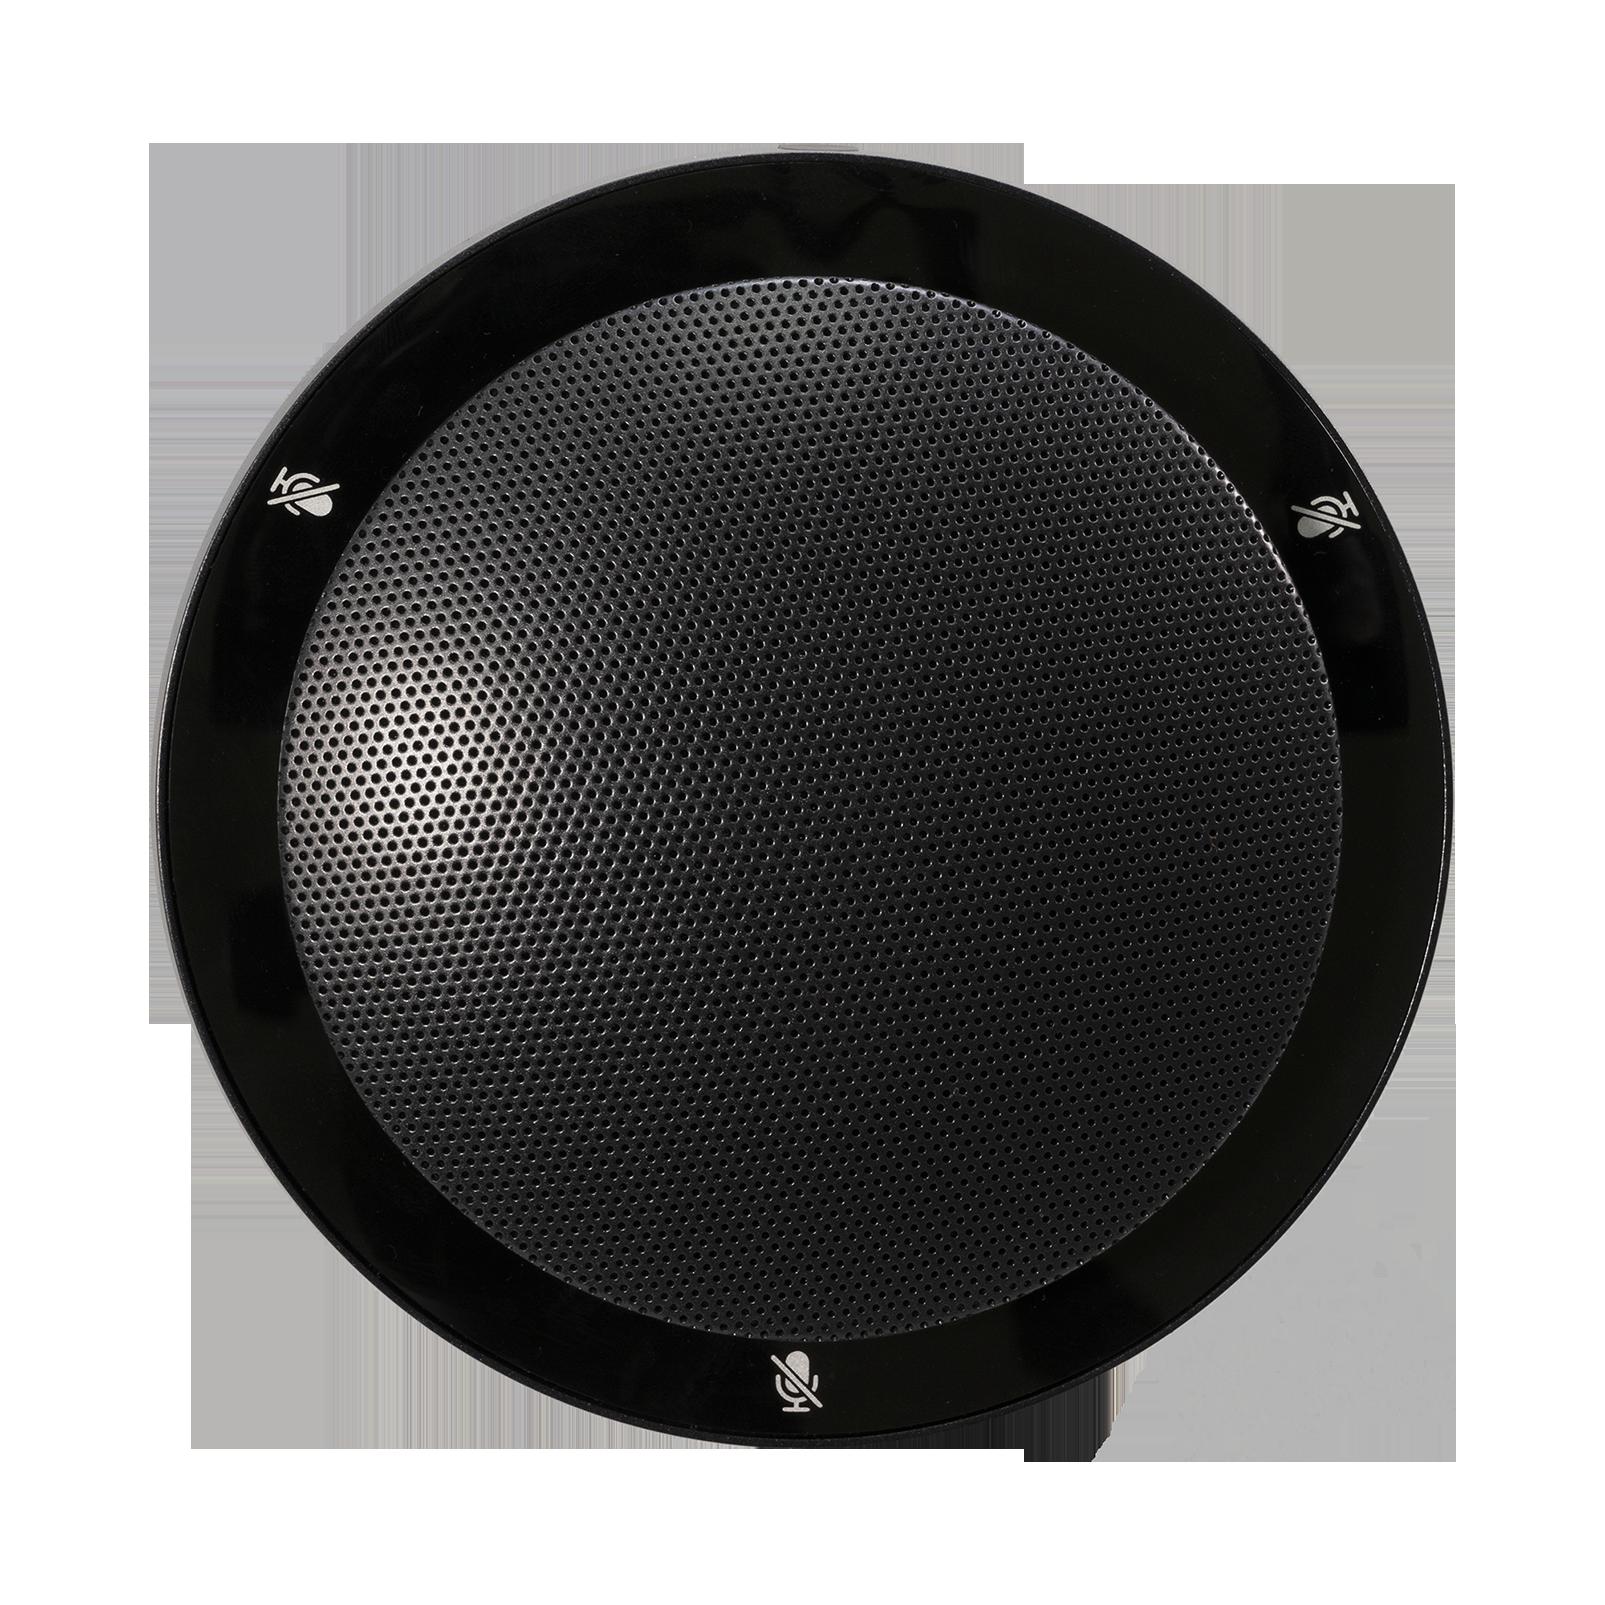 CBL301 - Black - Triple element, professional low-profile boundary layer microphone - Front